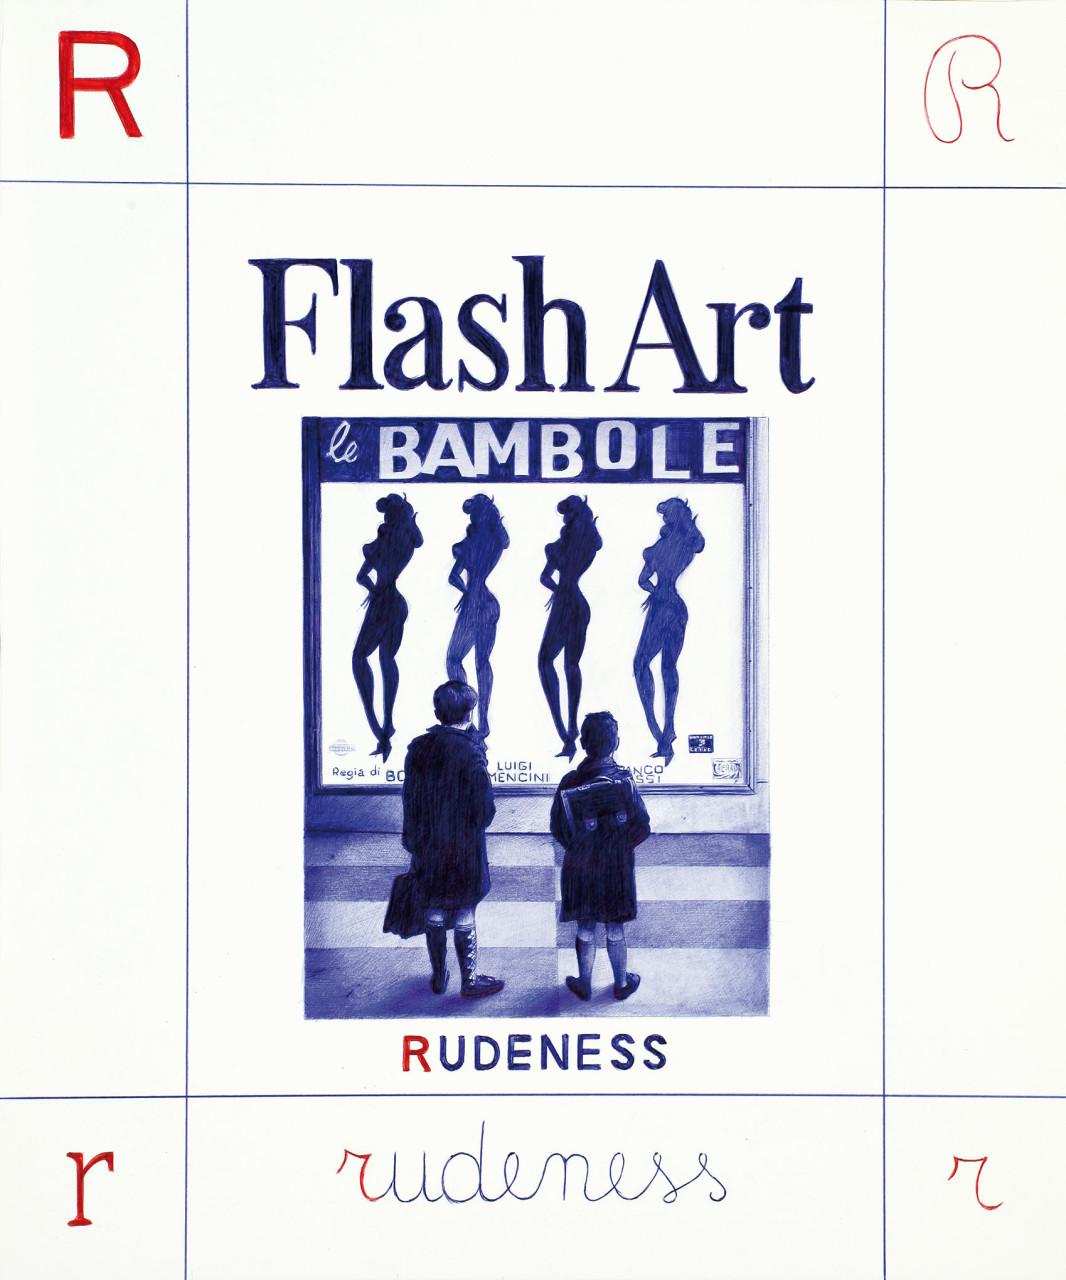 04R-rudeness_bassa